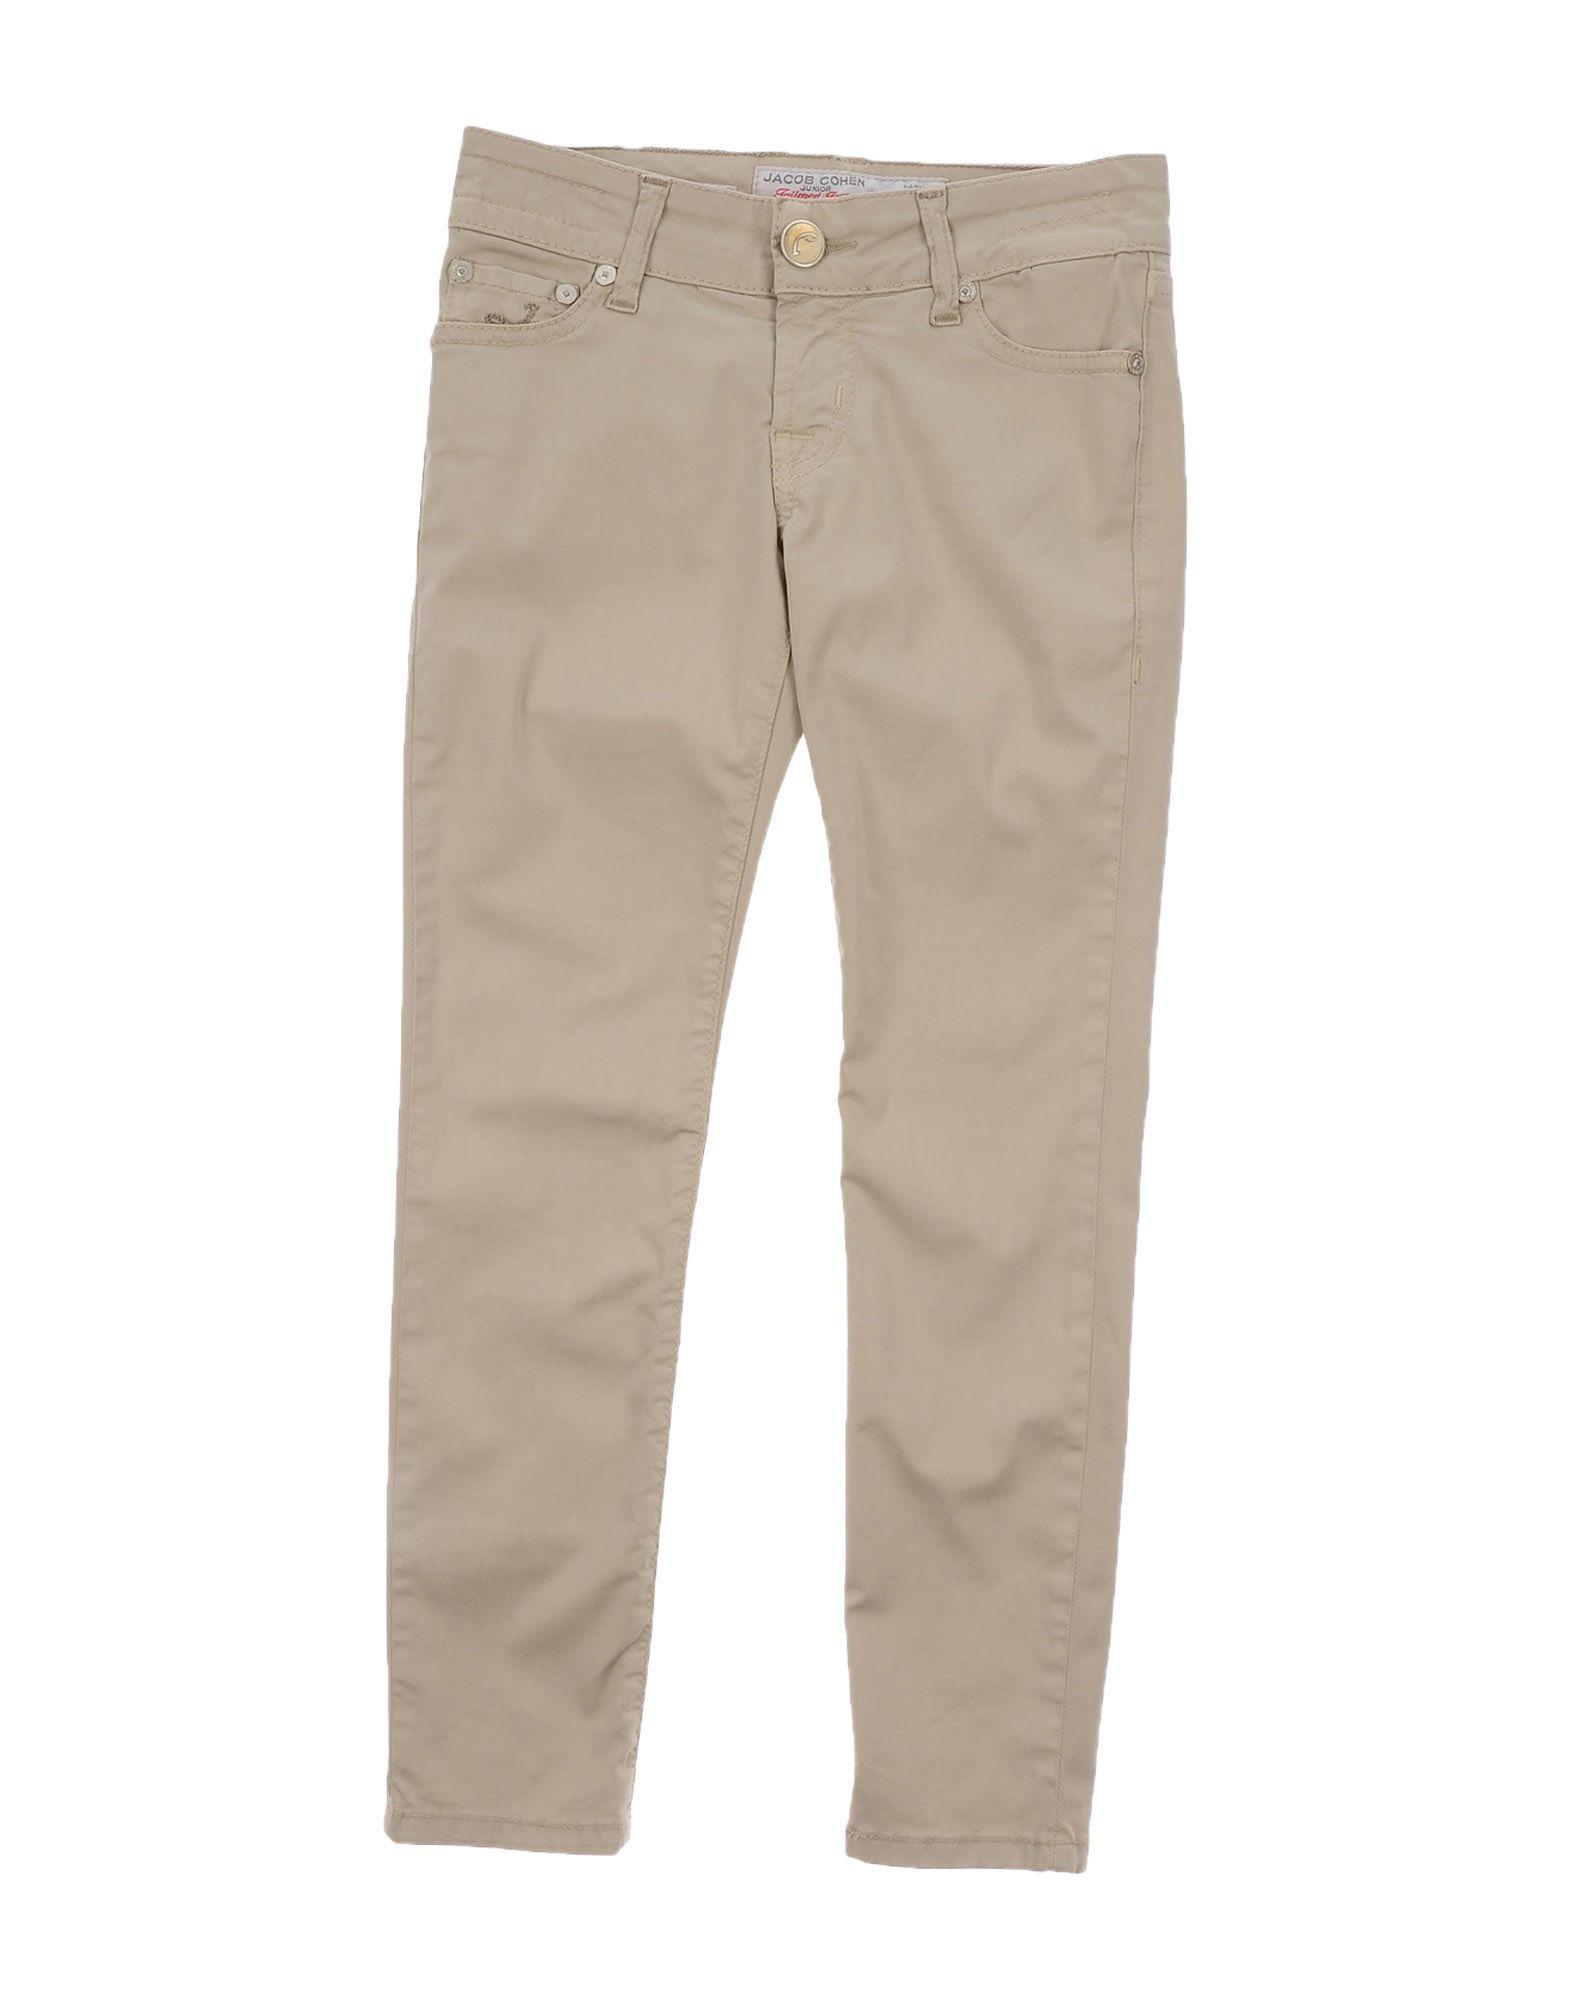 JACOB COHЁN JUNIOR Casual pants